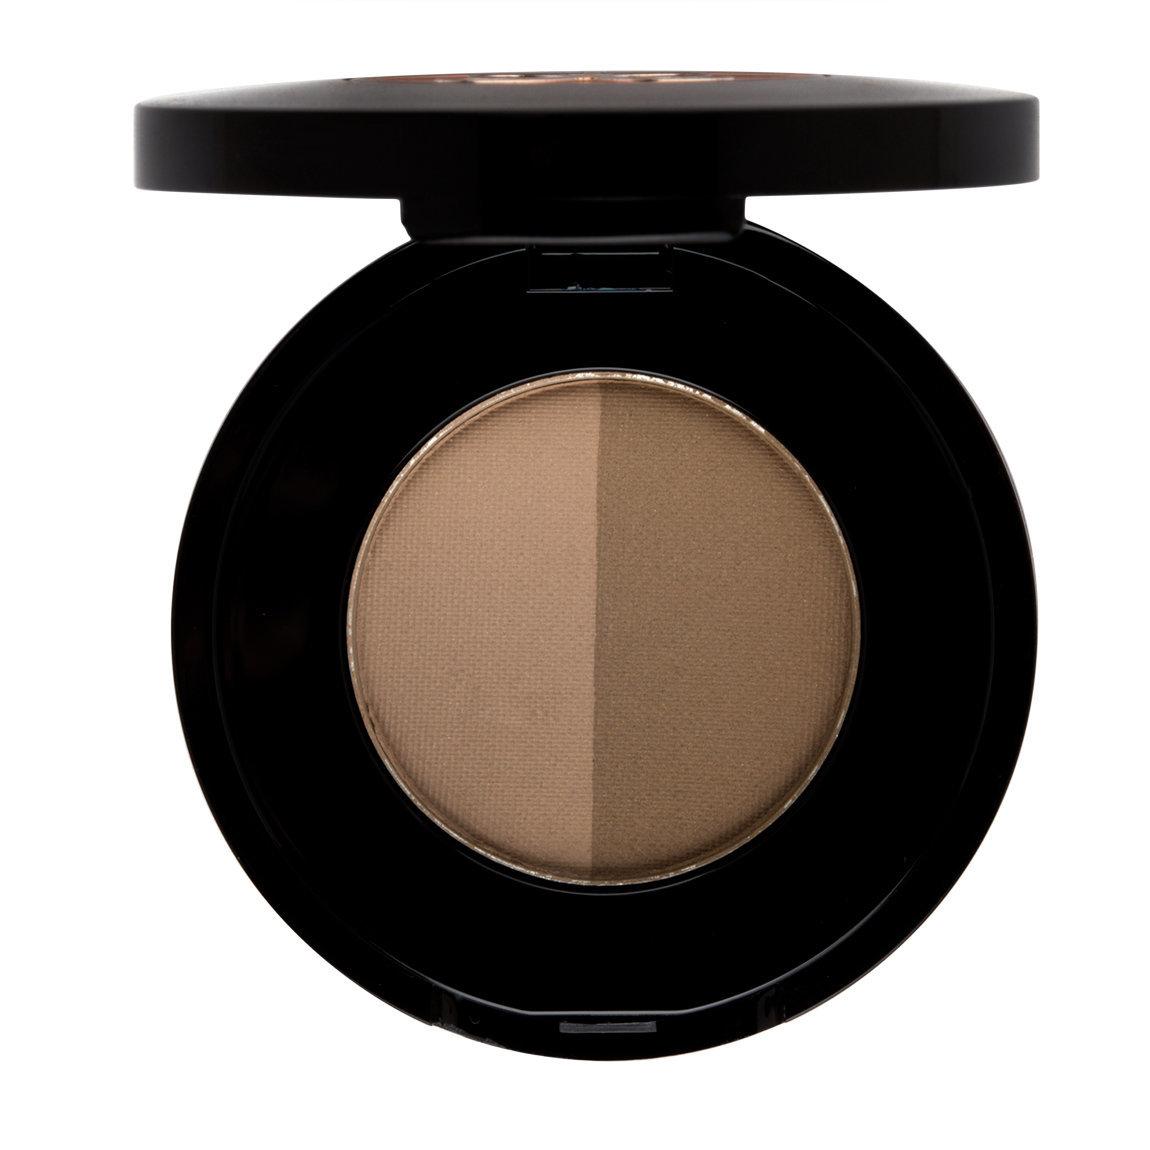 Anastasia Beverly Hills Brow Powder Duo Medium Brown product swatch.